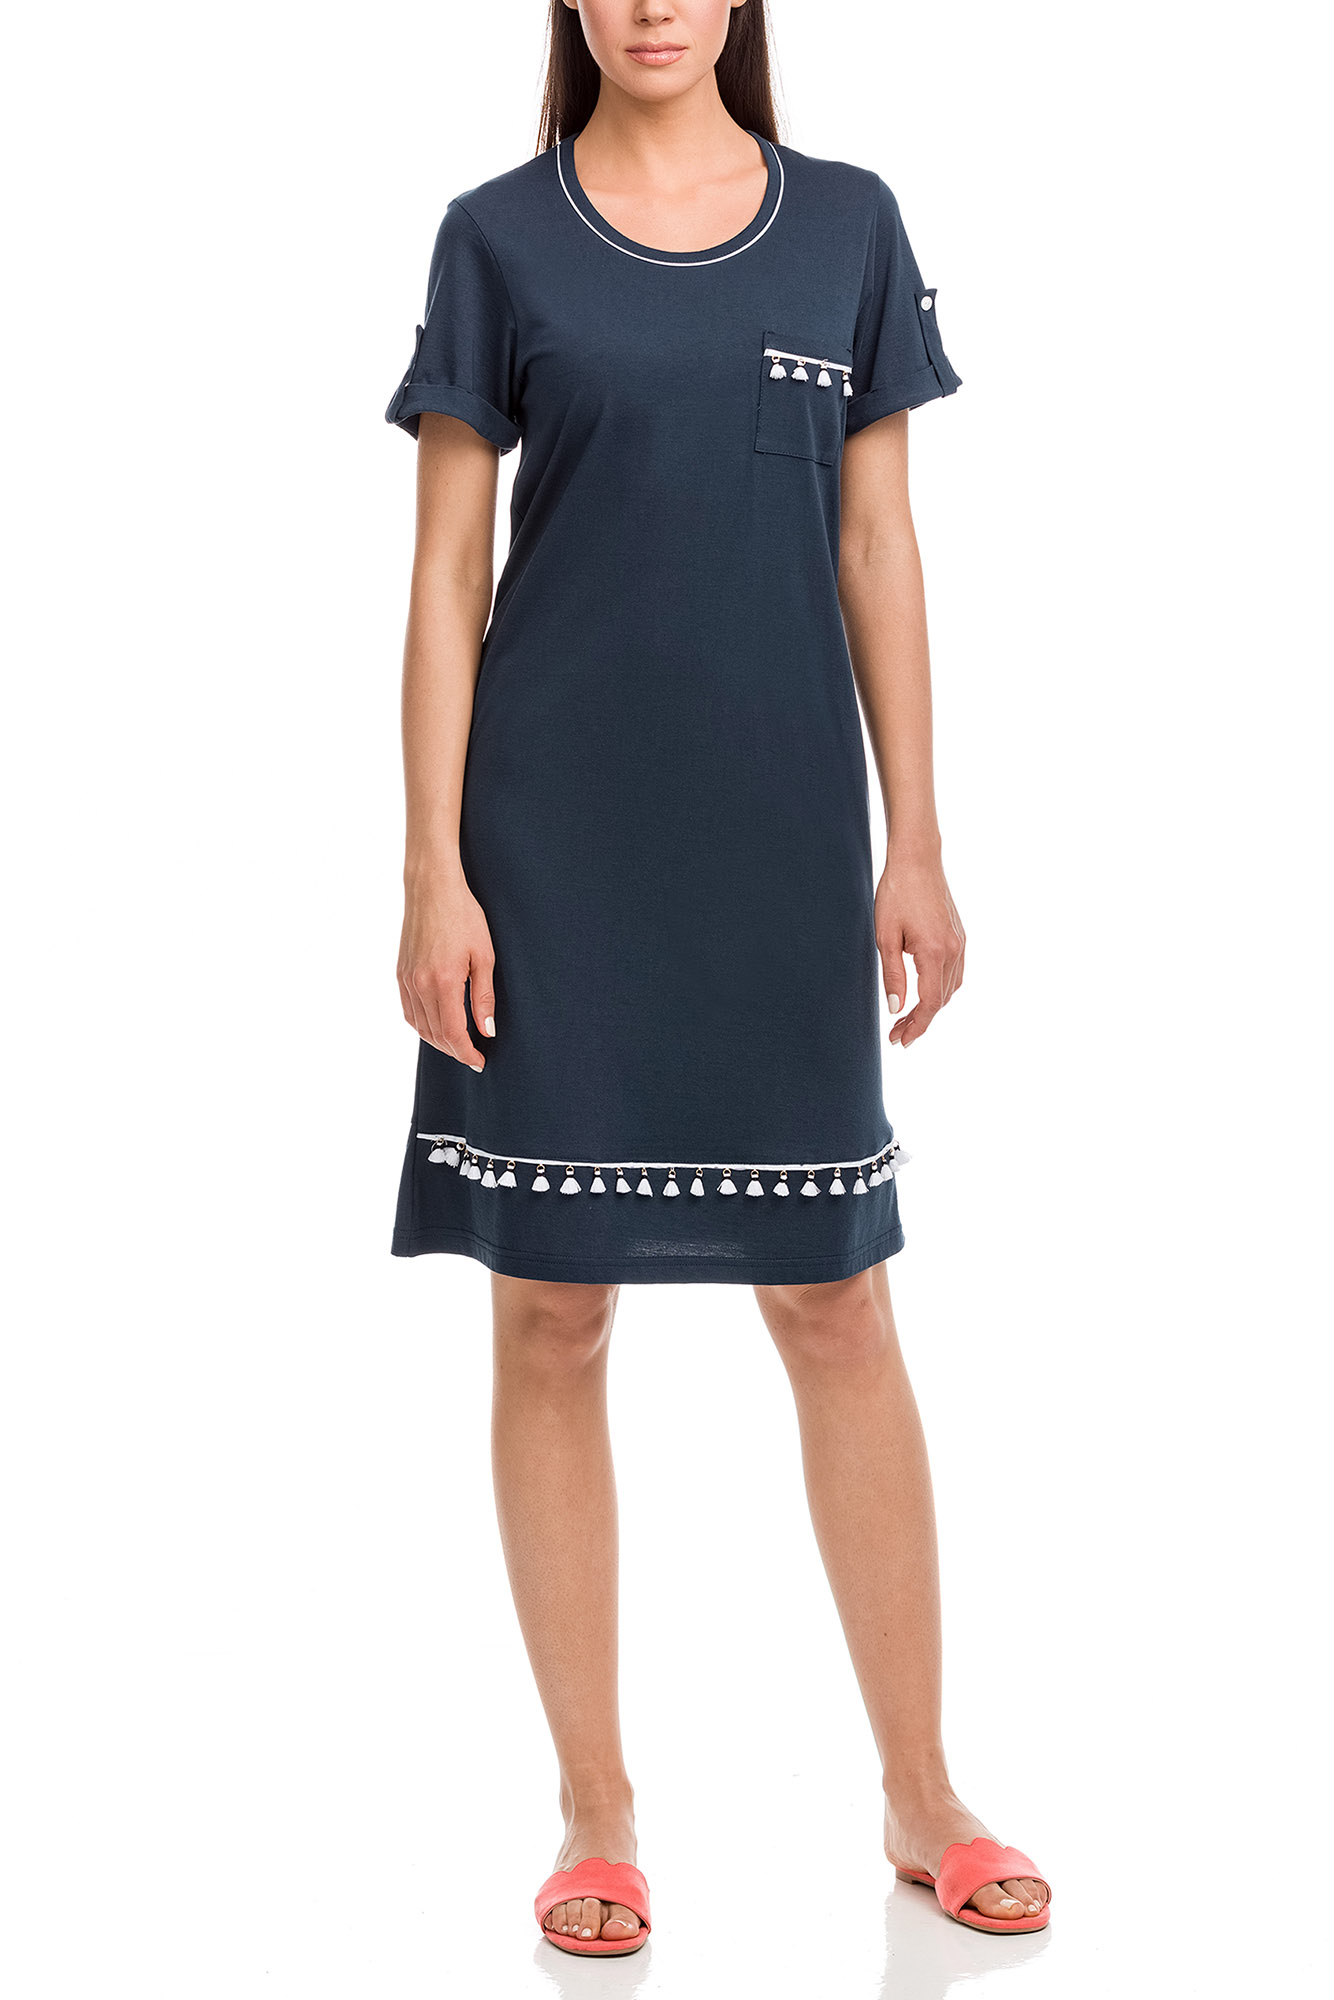 Vamp - Dámske šaty 12595 - Vamp blue oxford 4XL